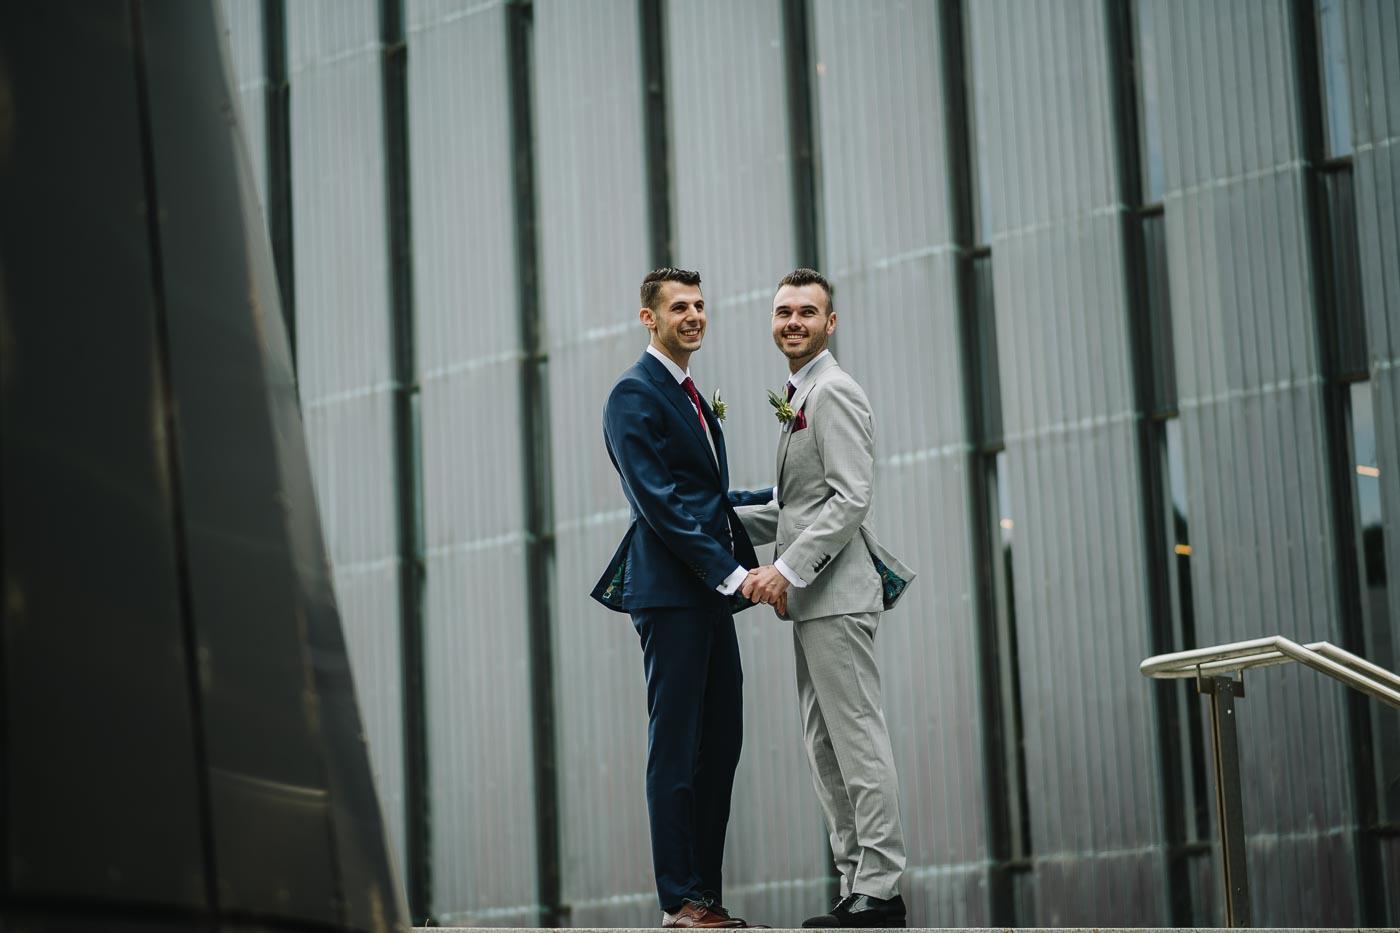 wedding-photography-university-sydney